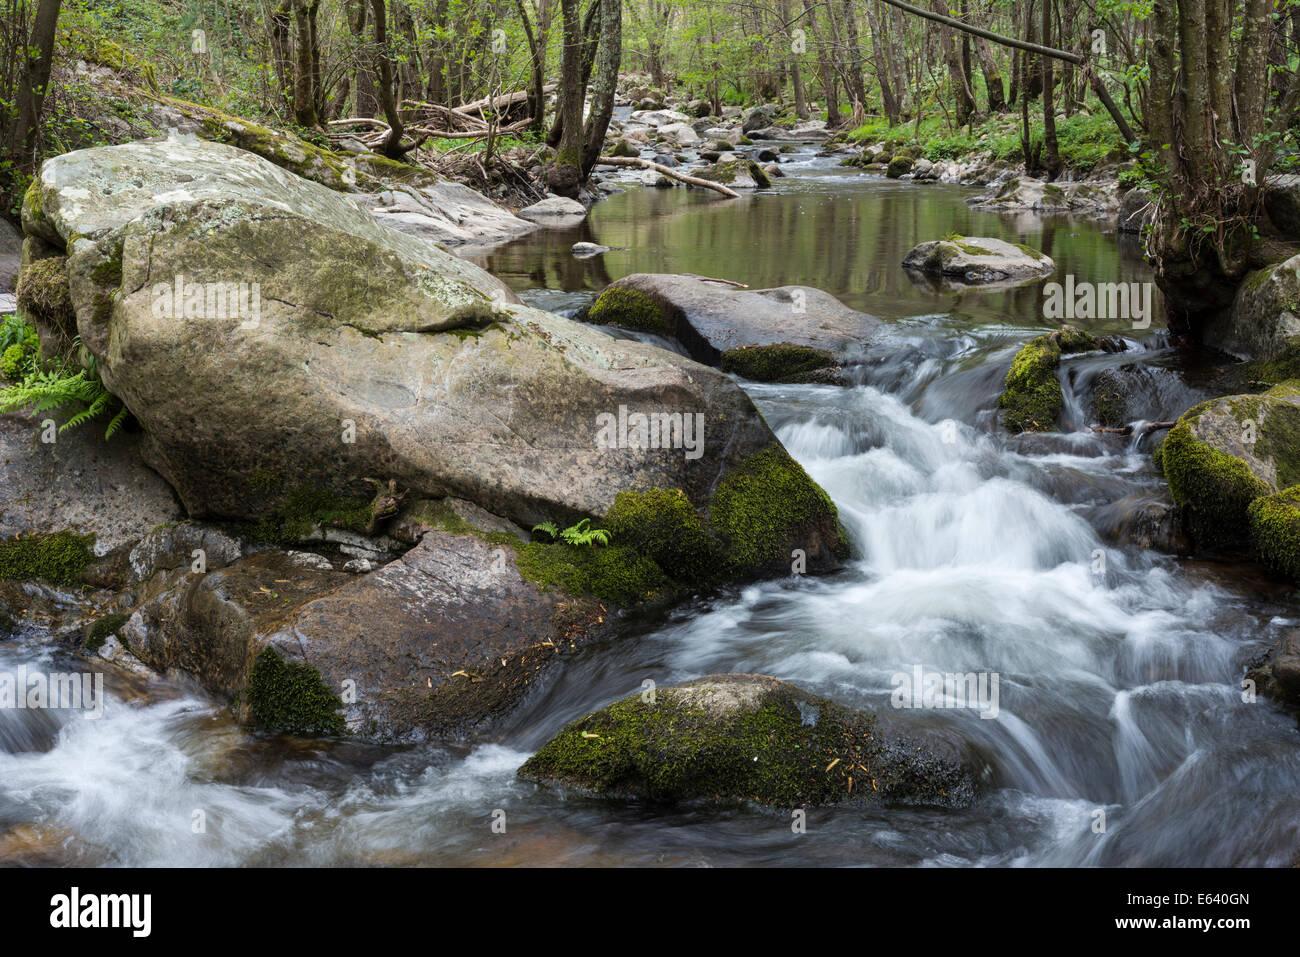 La Daronne mountain stream in the Ardèche, Saint-Félicien, Rhône-Alpes, France - Stock Image